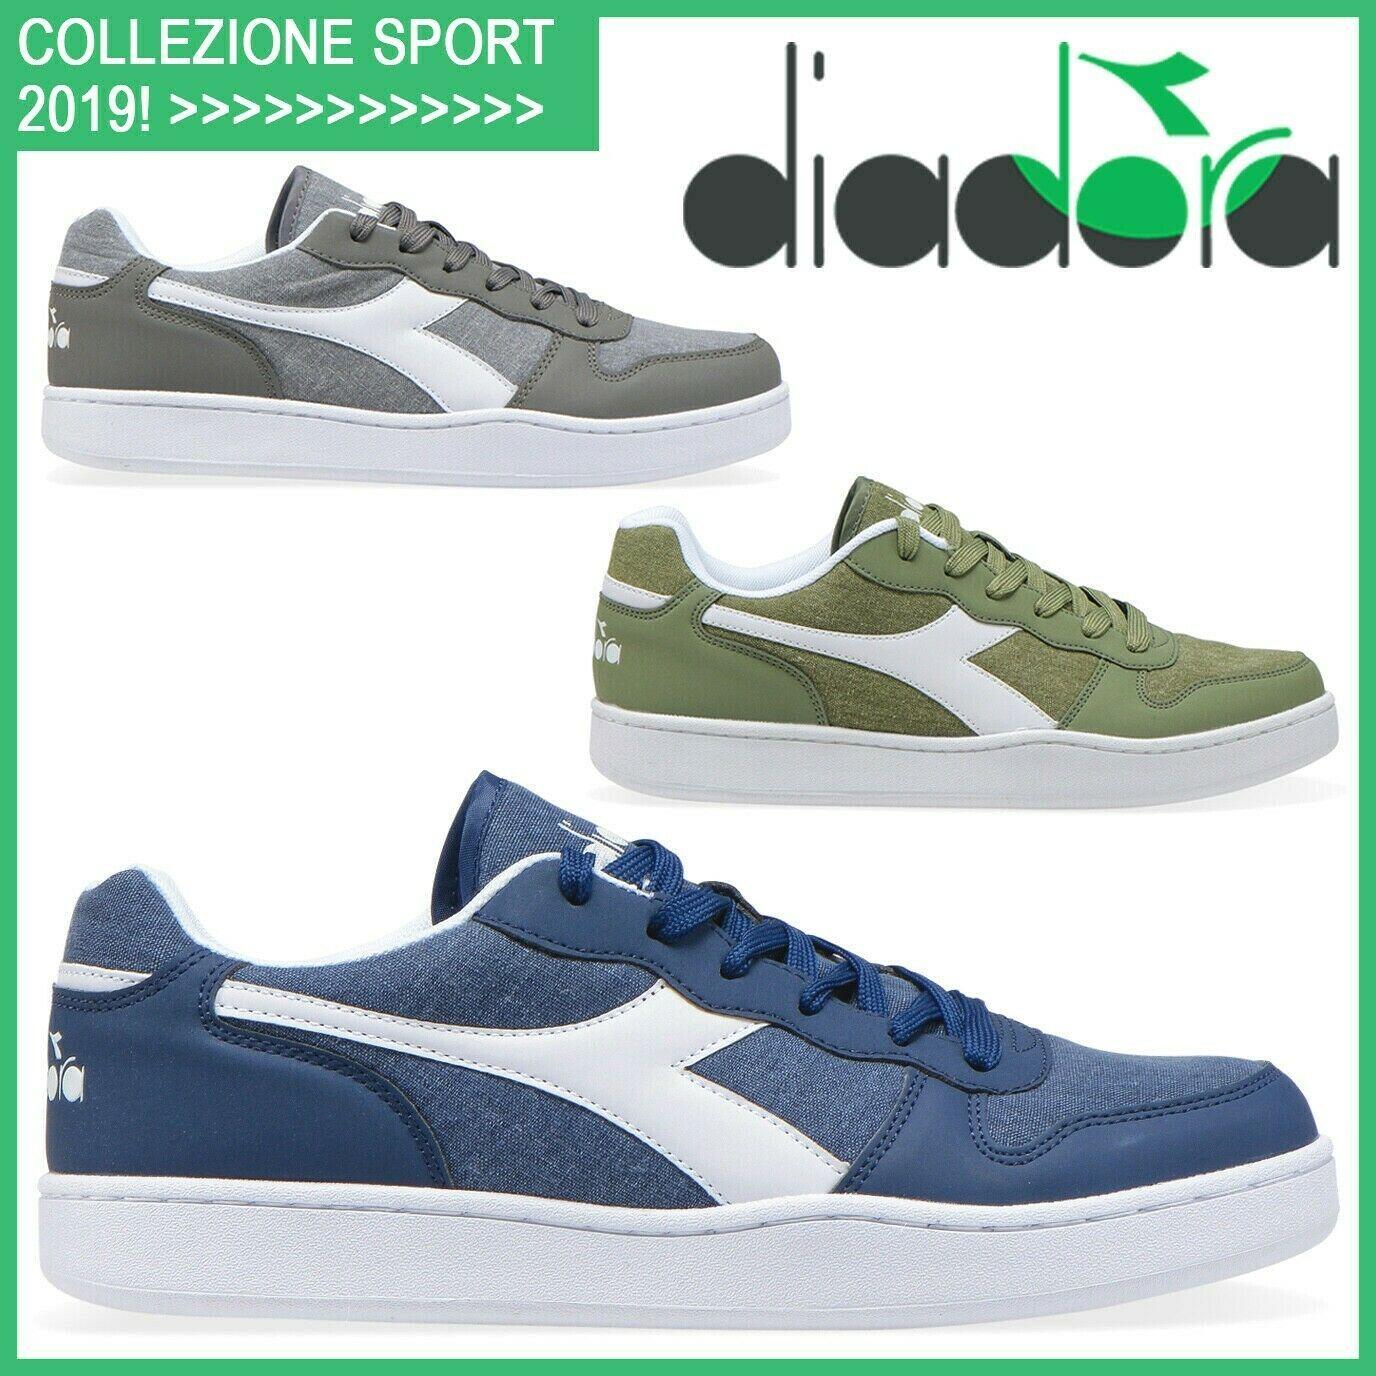 Scarpe Uomo DIADORA Sneakers in Pelle da Ginnastica Sportive